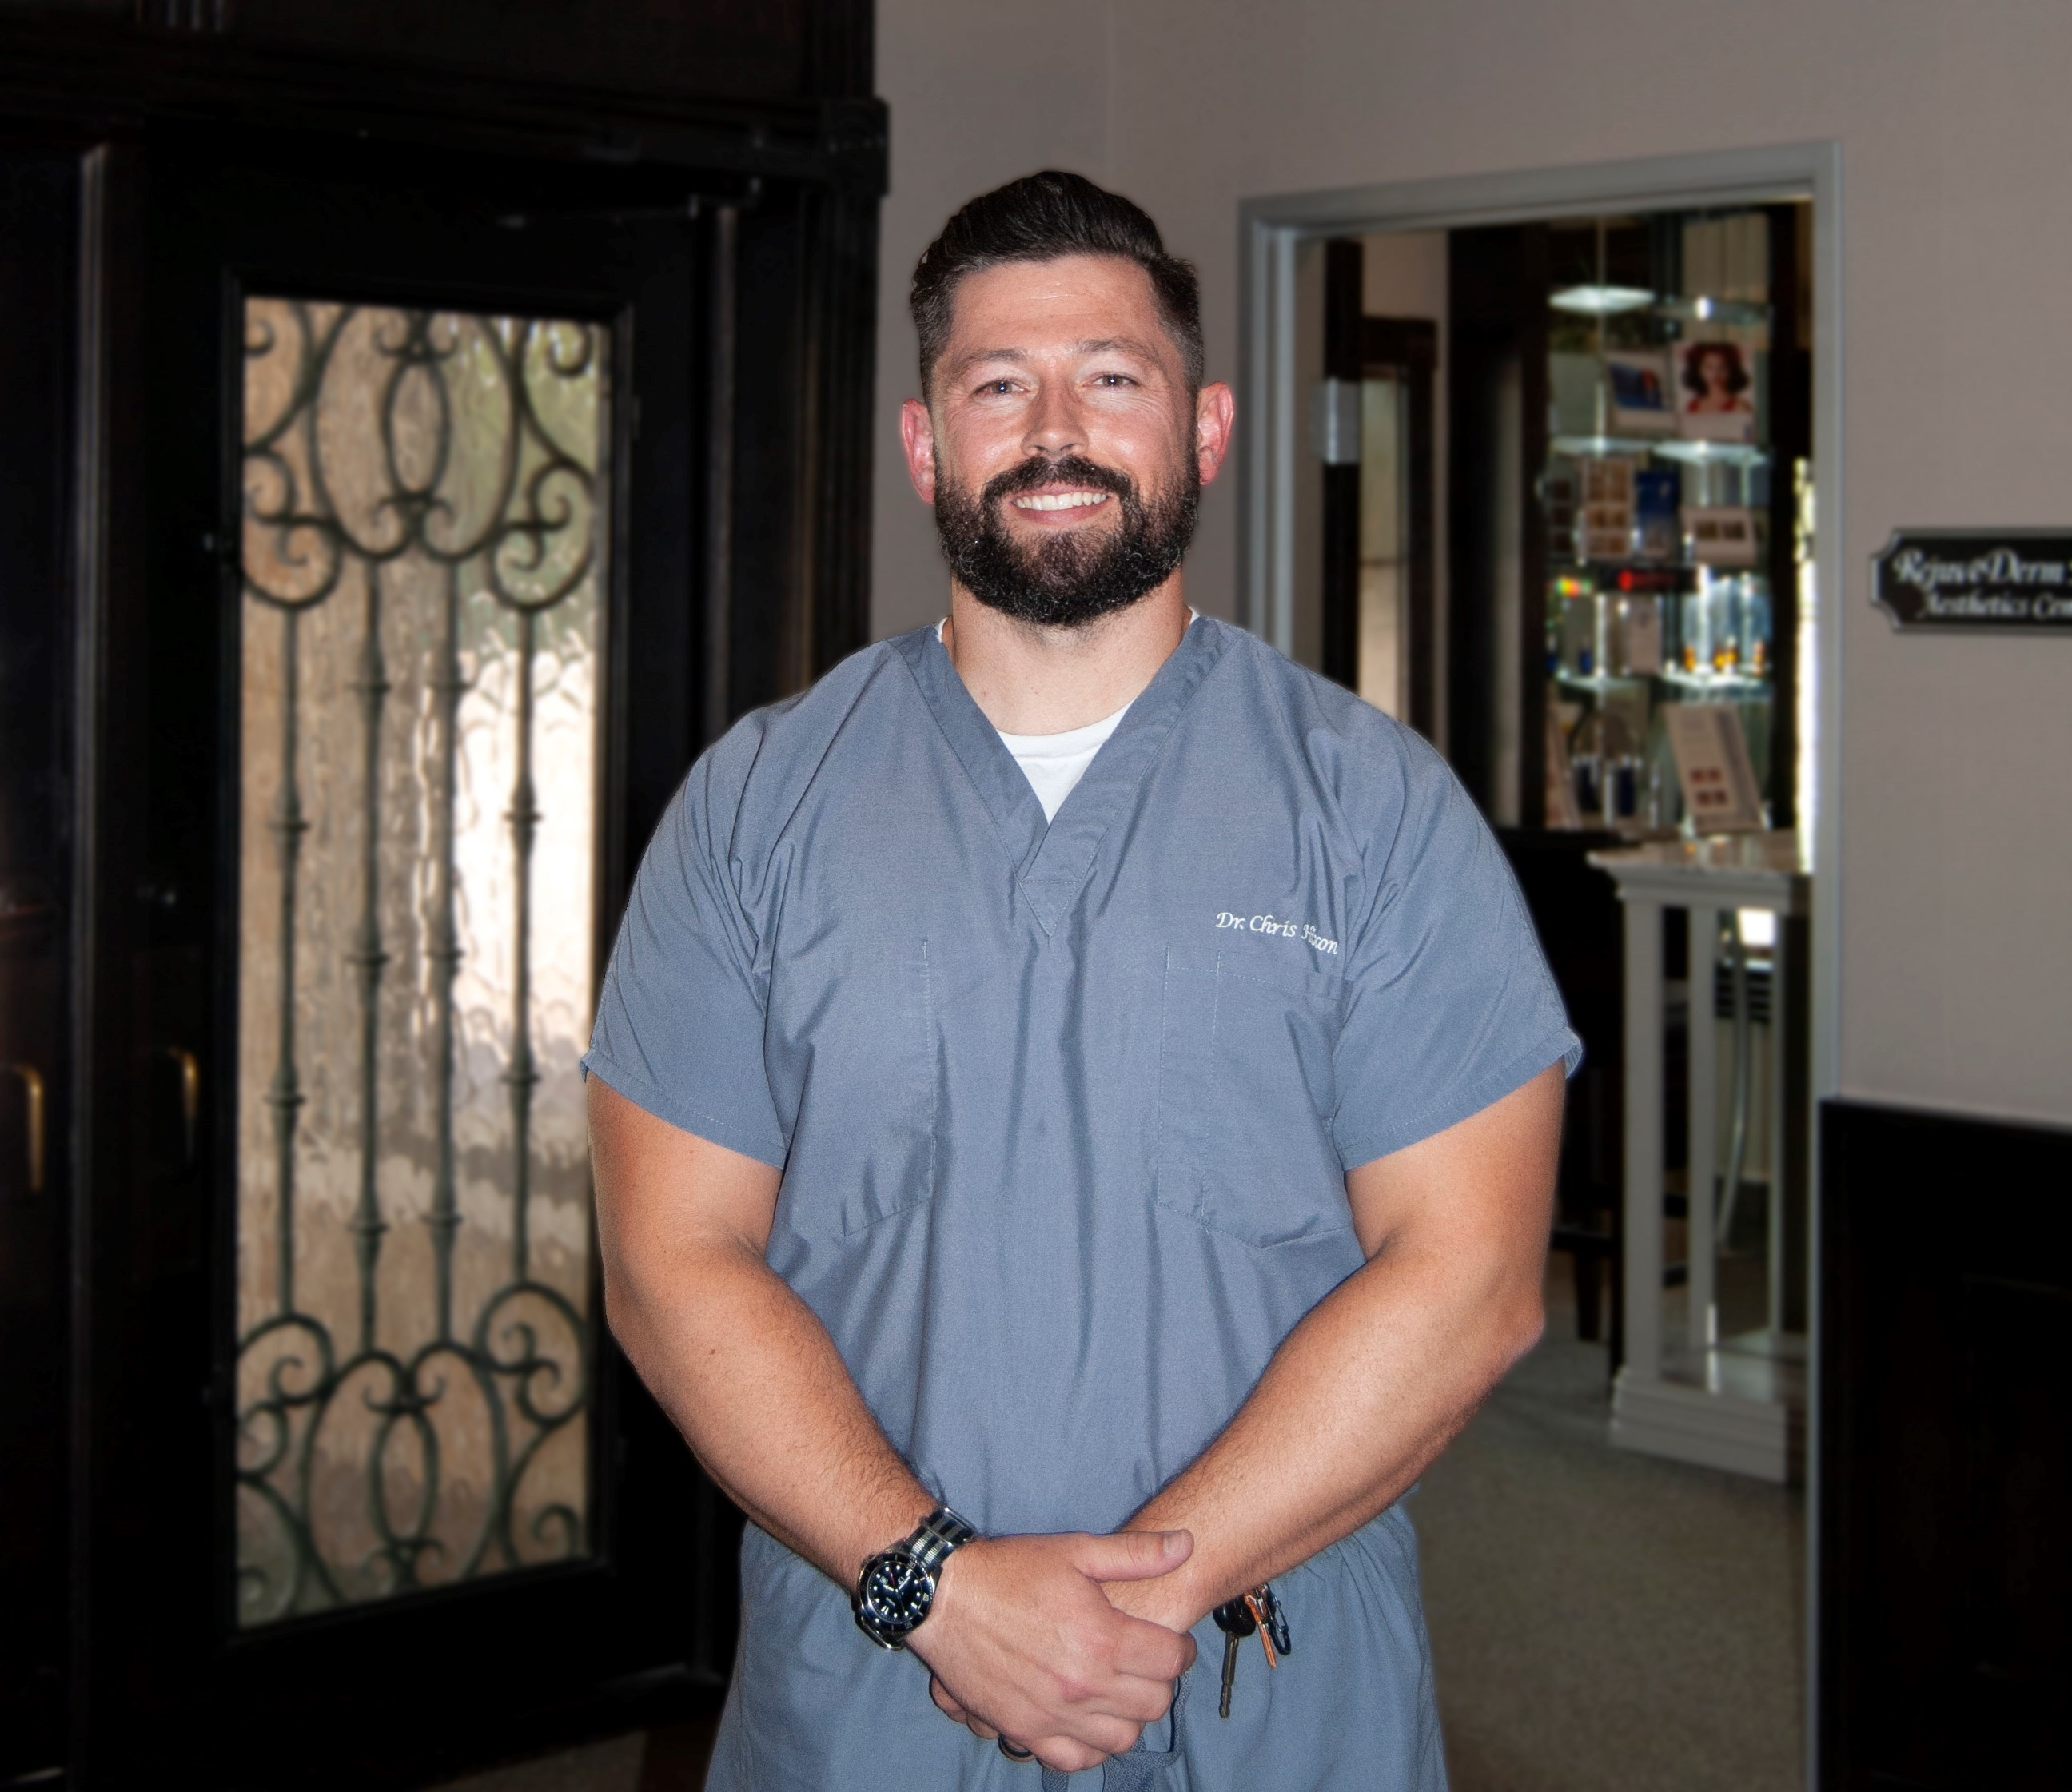 Dr. Chris Hixon